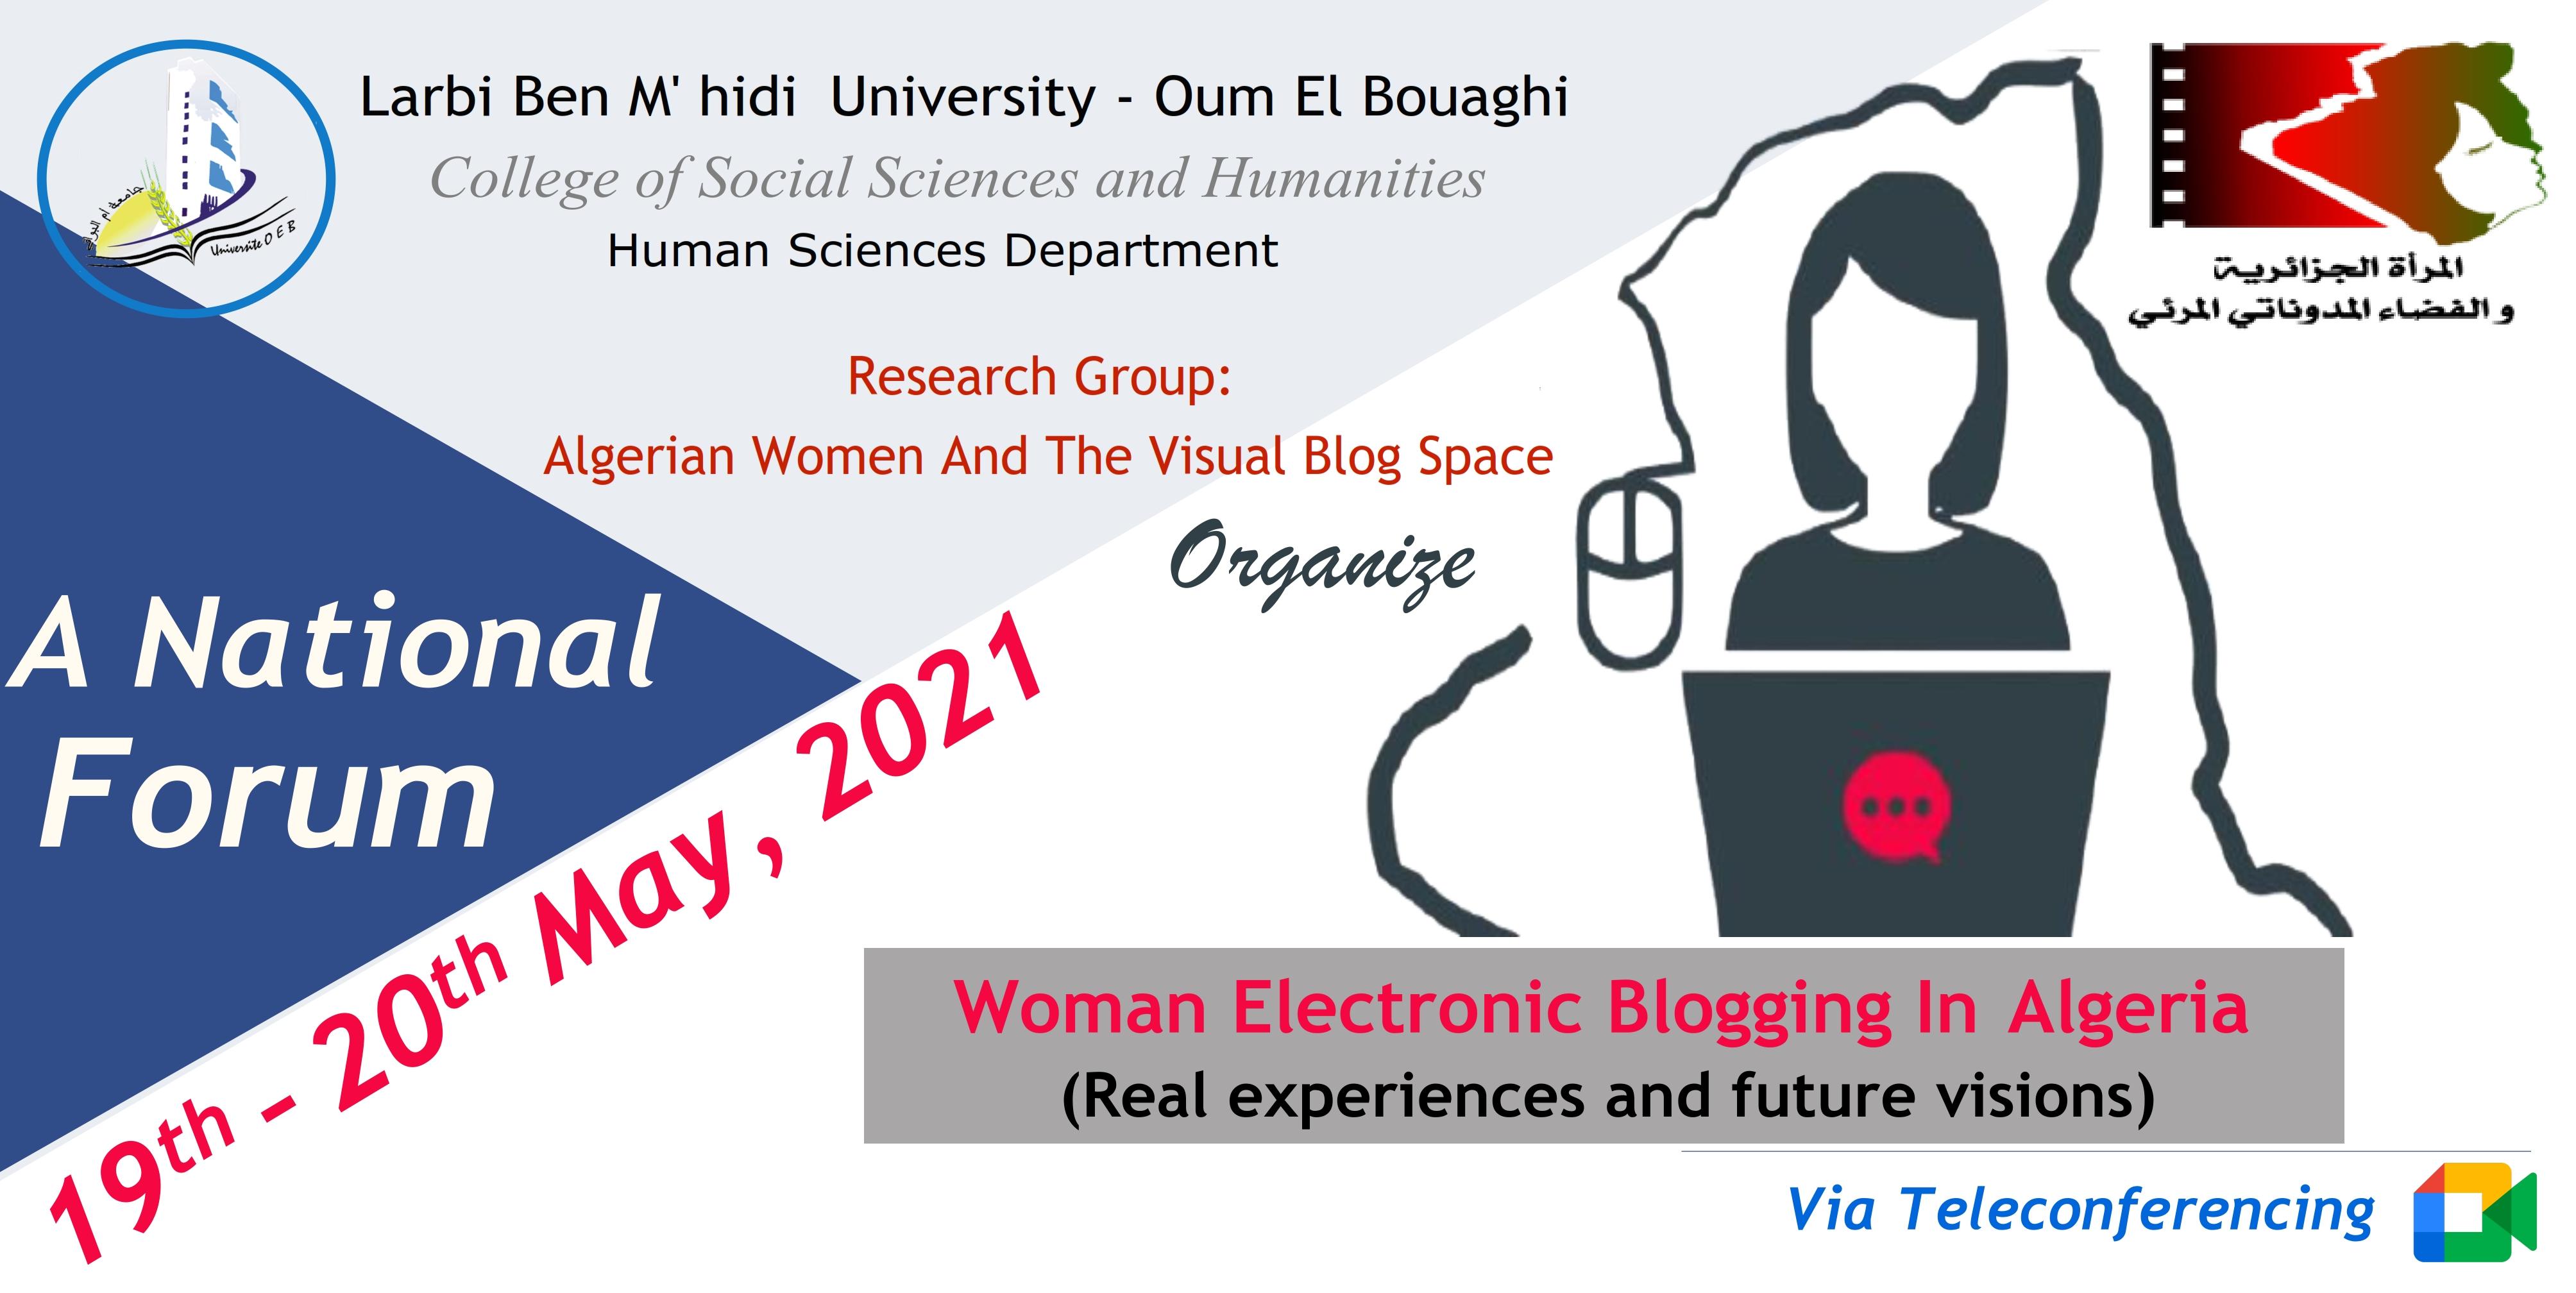 Woman Electronic Blogging In Algeria